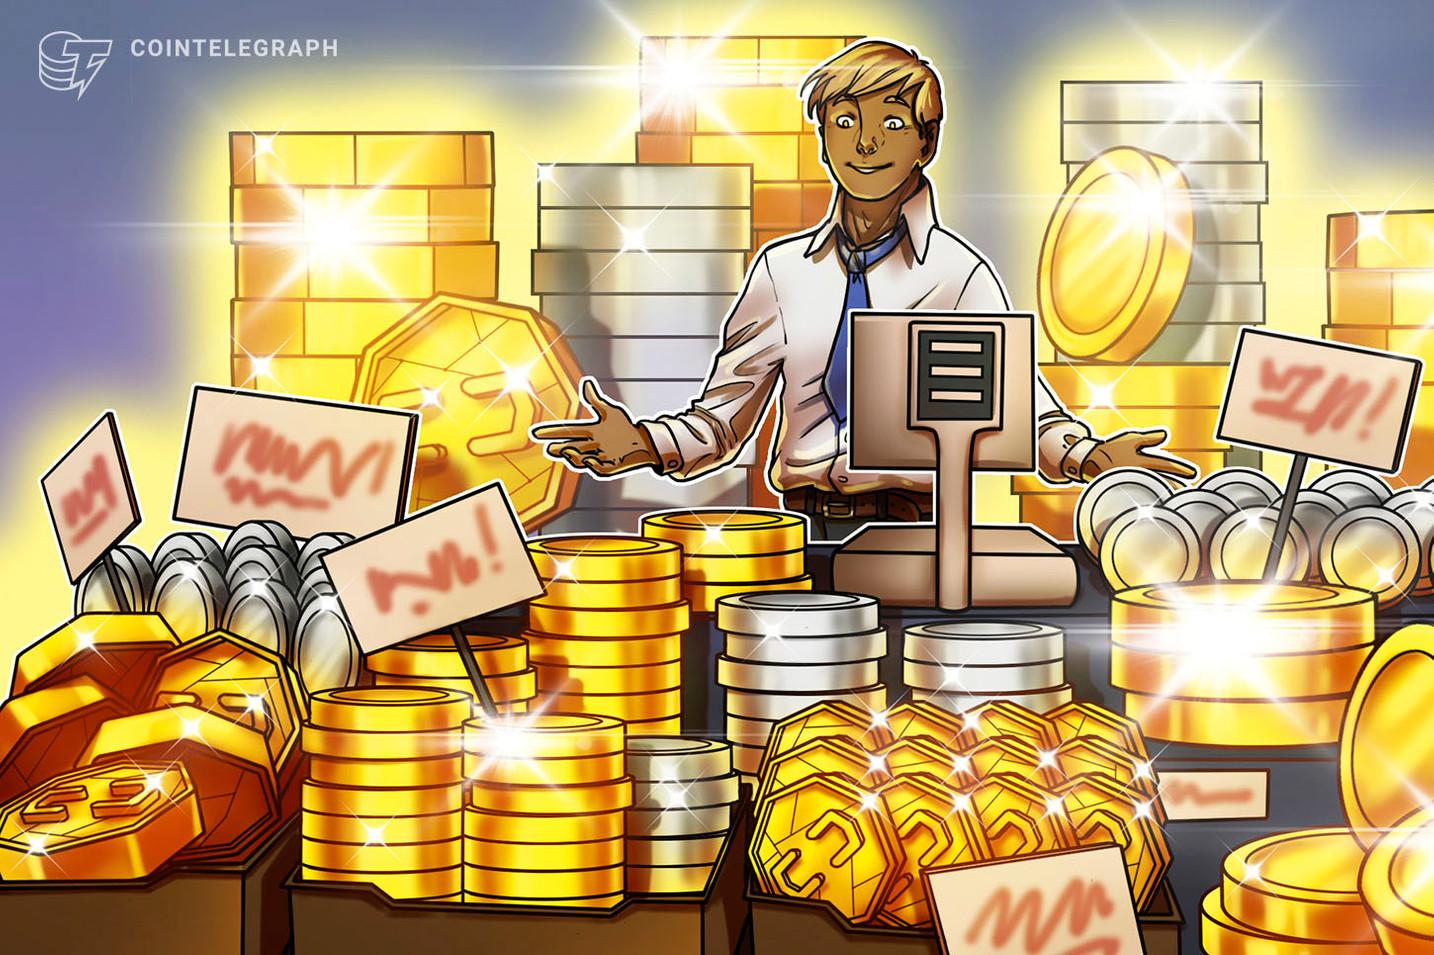 Luego del desapalancamiento récord de Bitcoin, Bithumb lanza trading de margen con 5x de apalancamiento